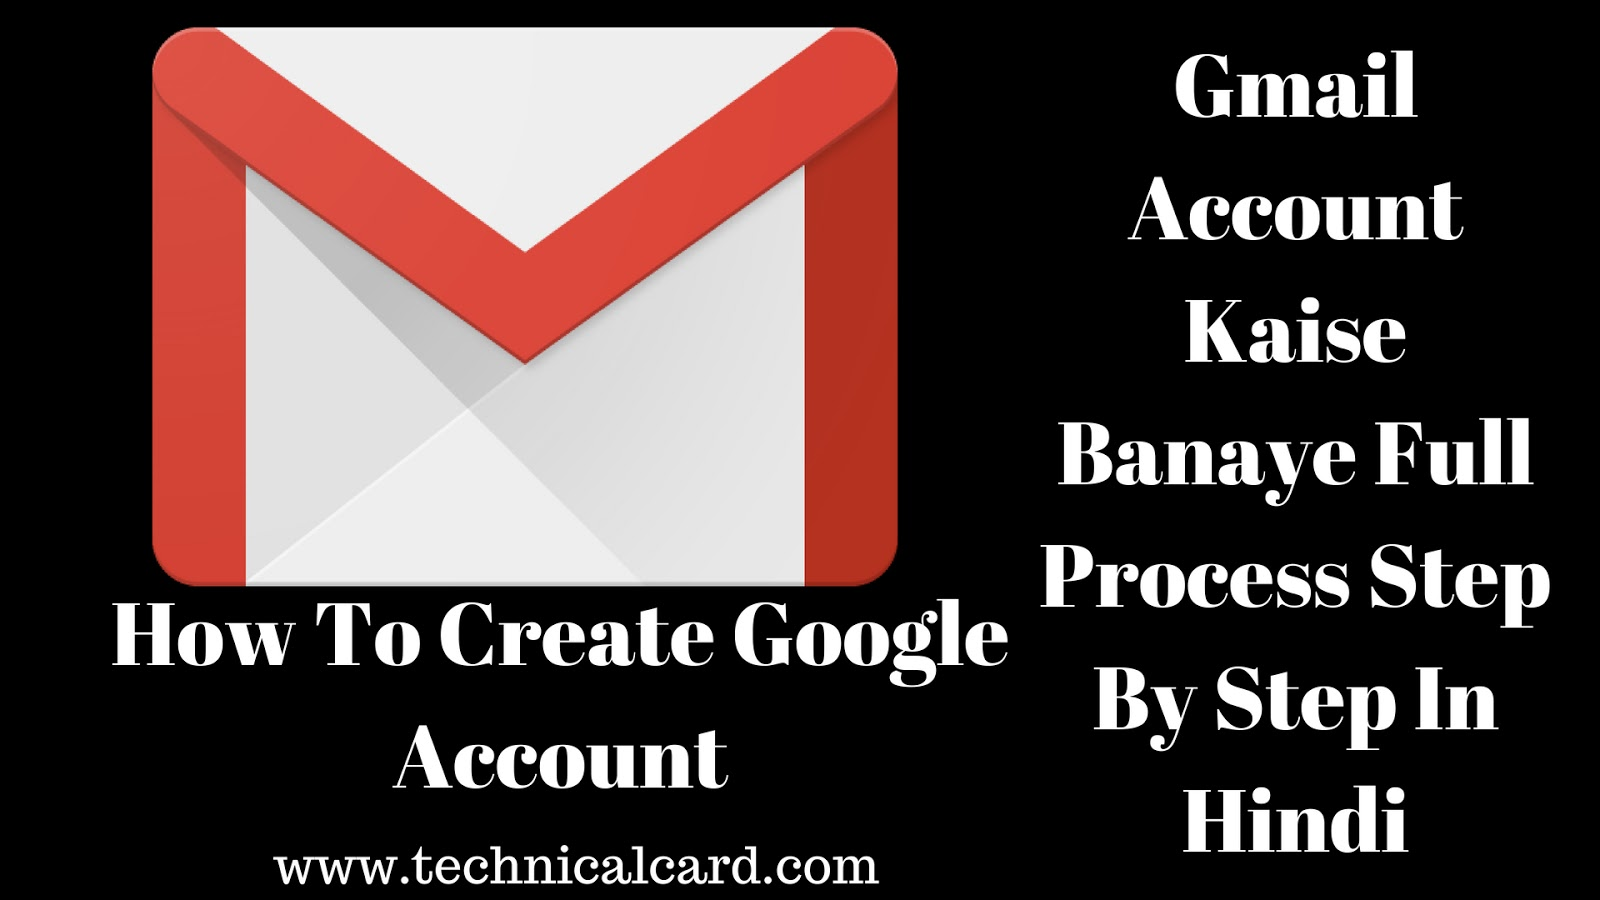 Gmail Account Kaise Banaye Full Process Step By Step In Hindi, google par gmail account kaise banaye,gmail id kaise banaye,